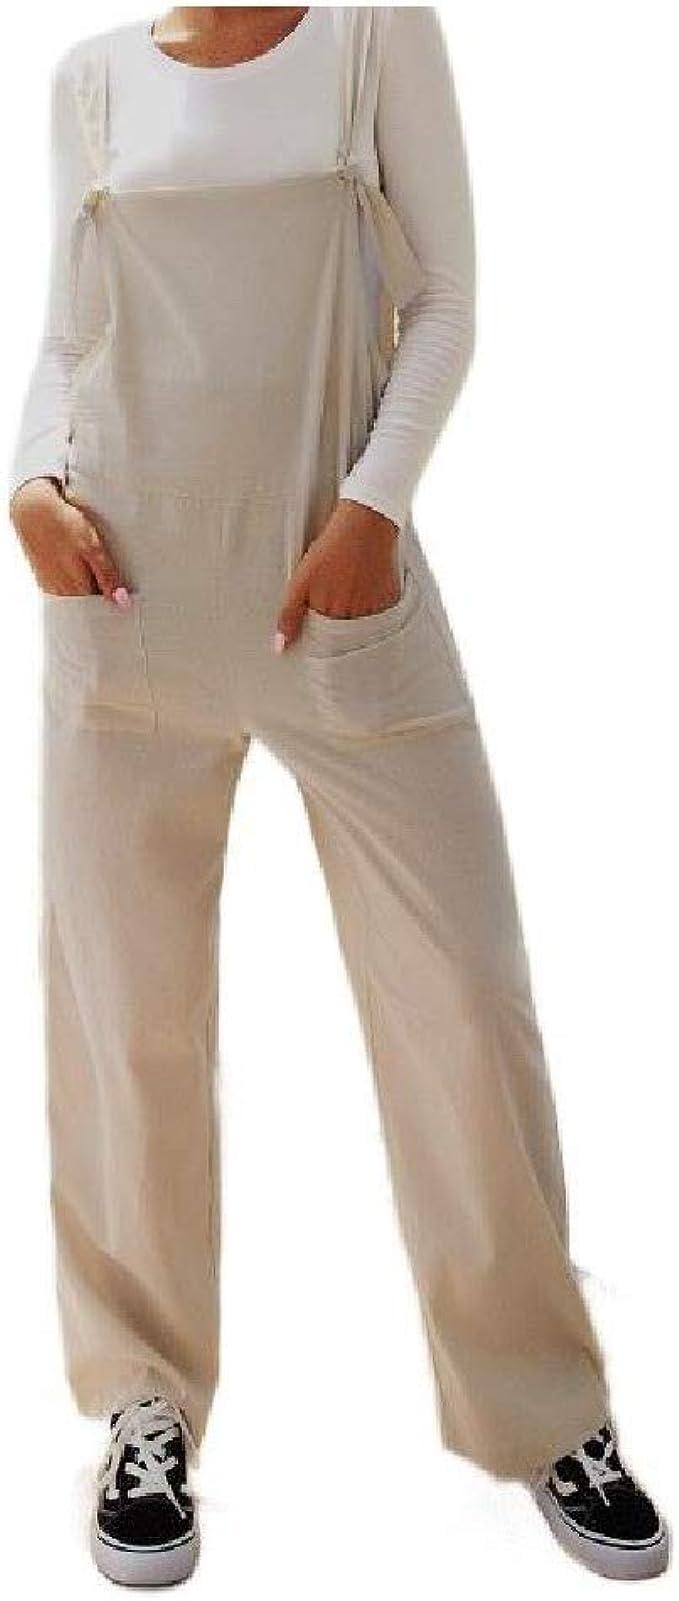 UUYUK Women Jumpsuit Romper Loose Fit Baggy Ripped Distressed Denim Bib Overalls